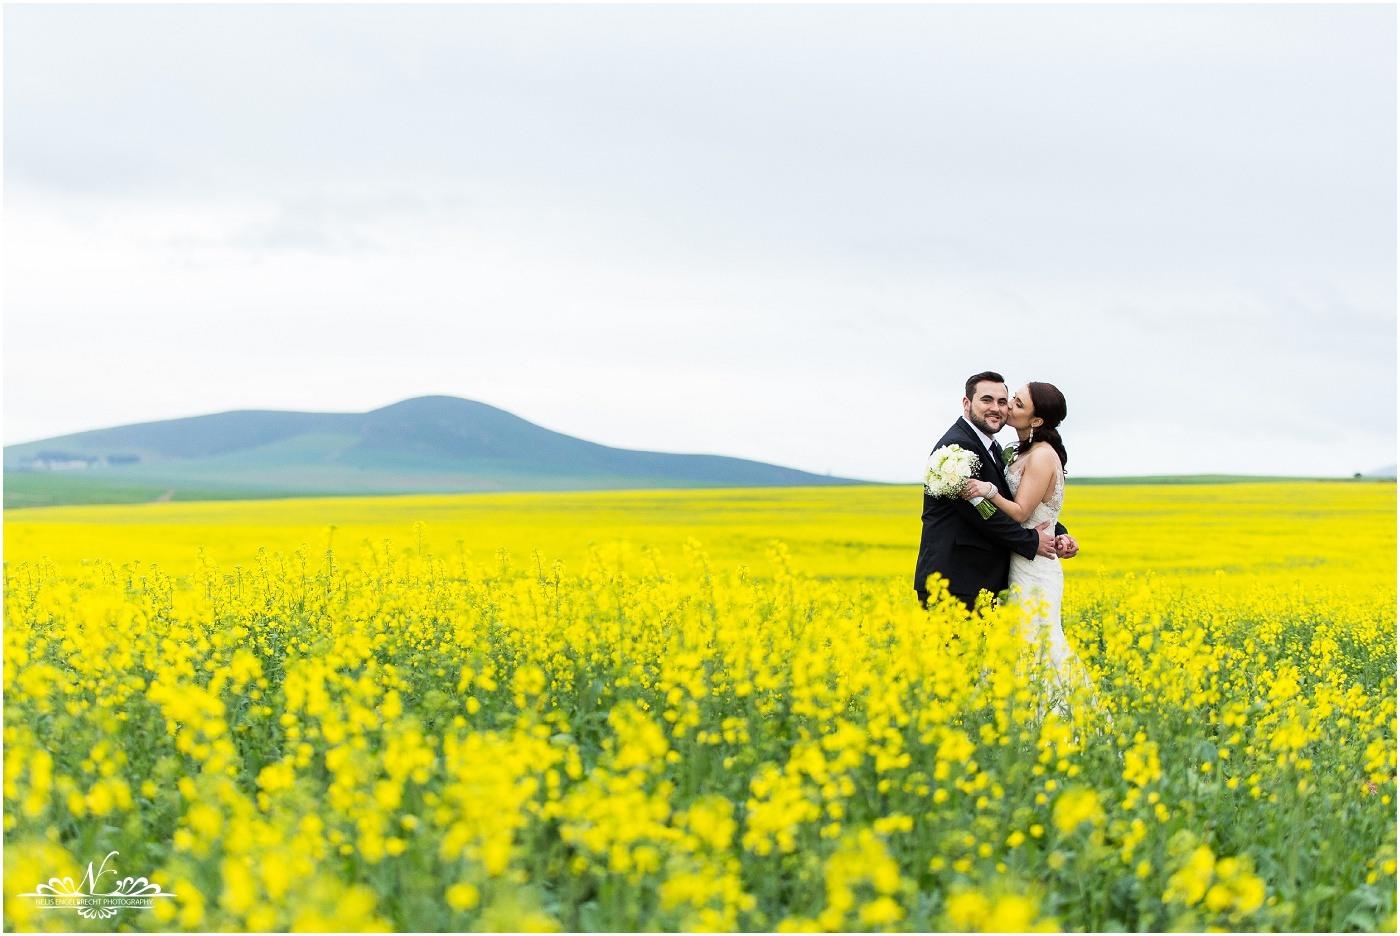 Eensgezind-Wedding-Photos-Nelis-Engelbrecht-Photography-136